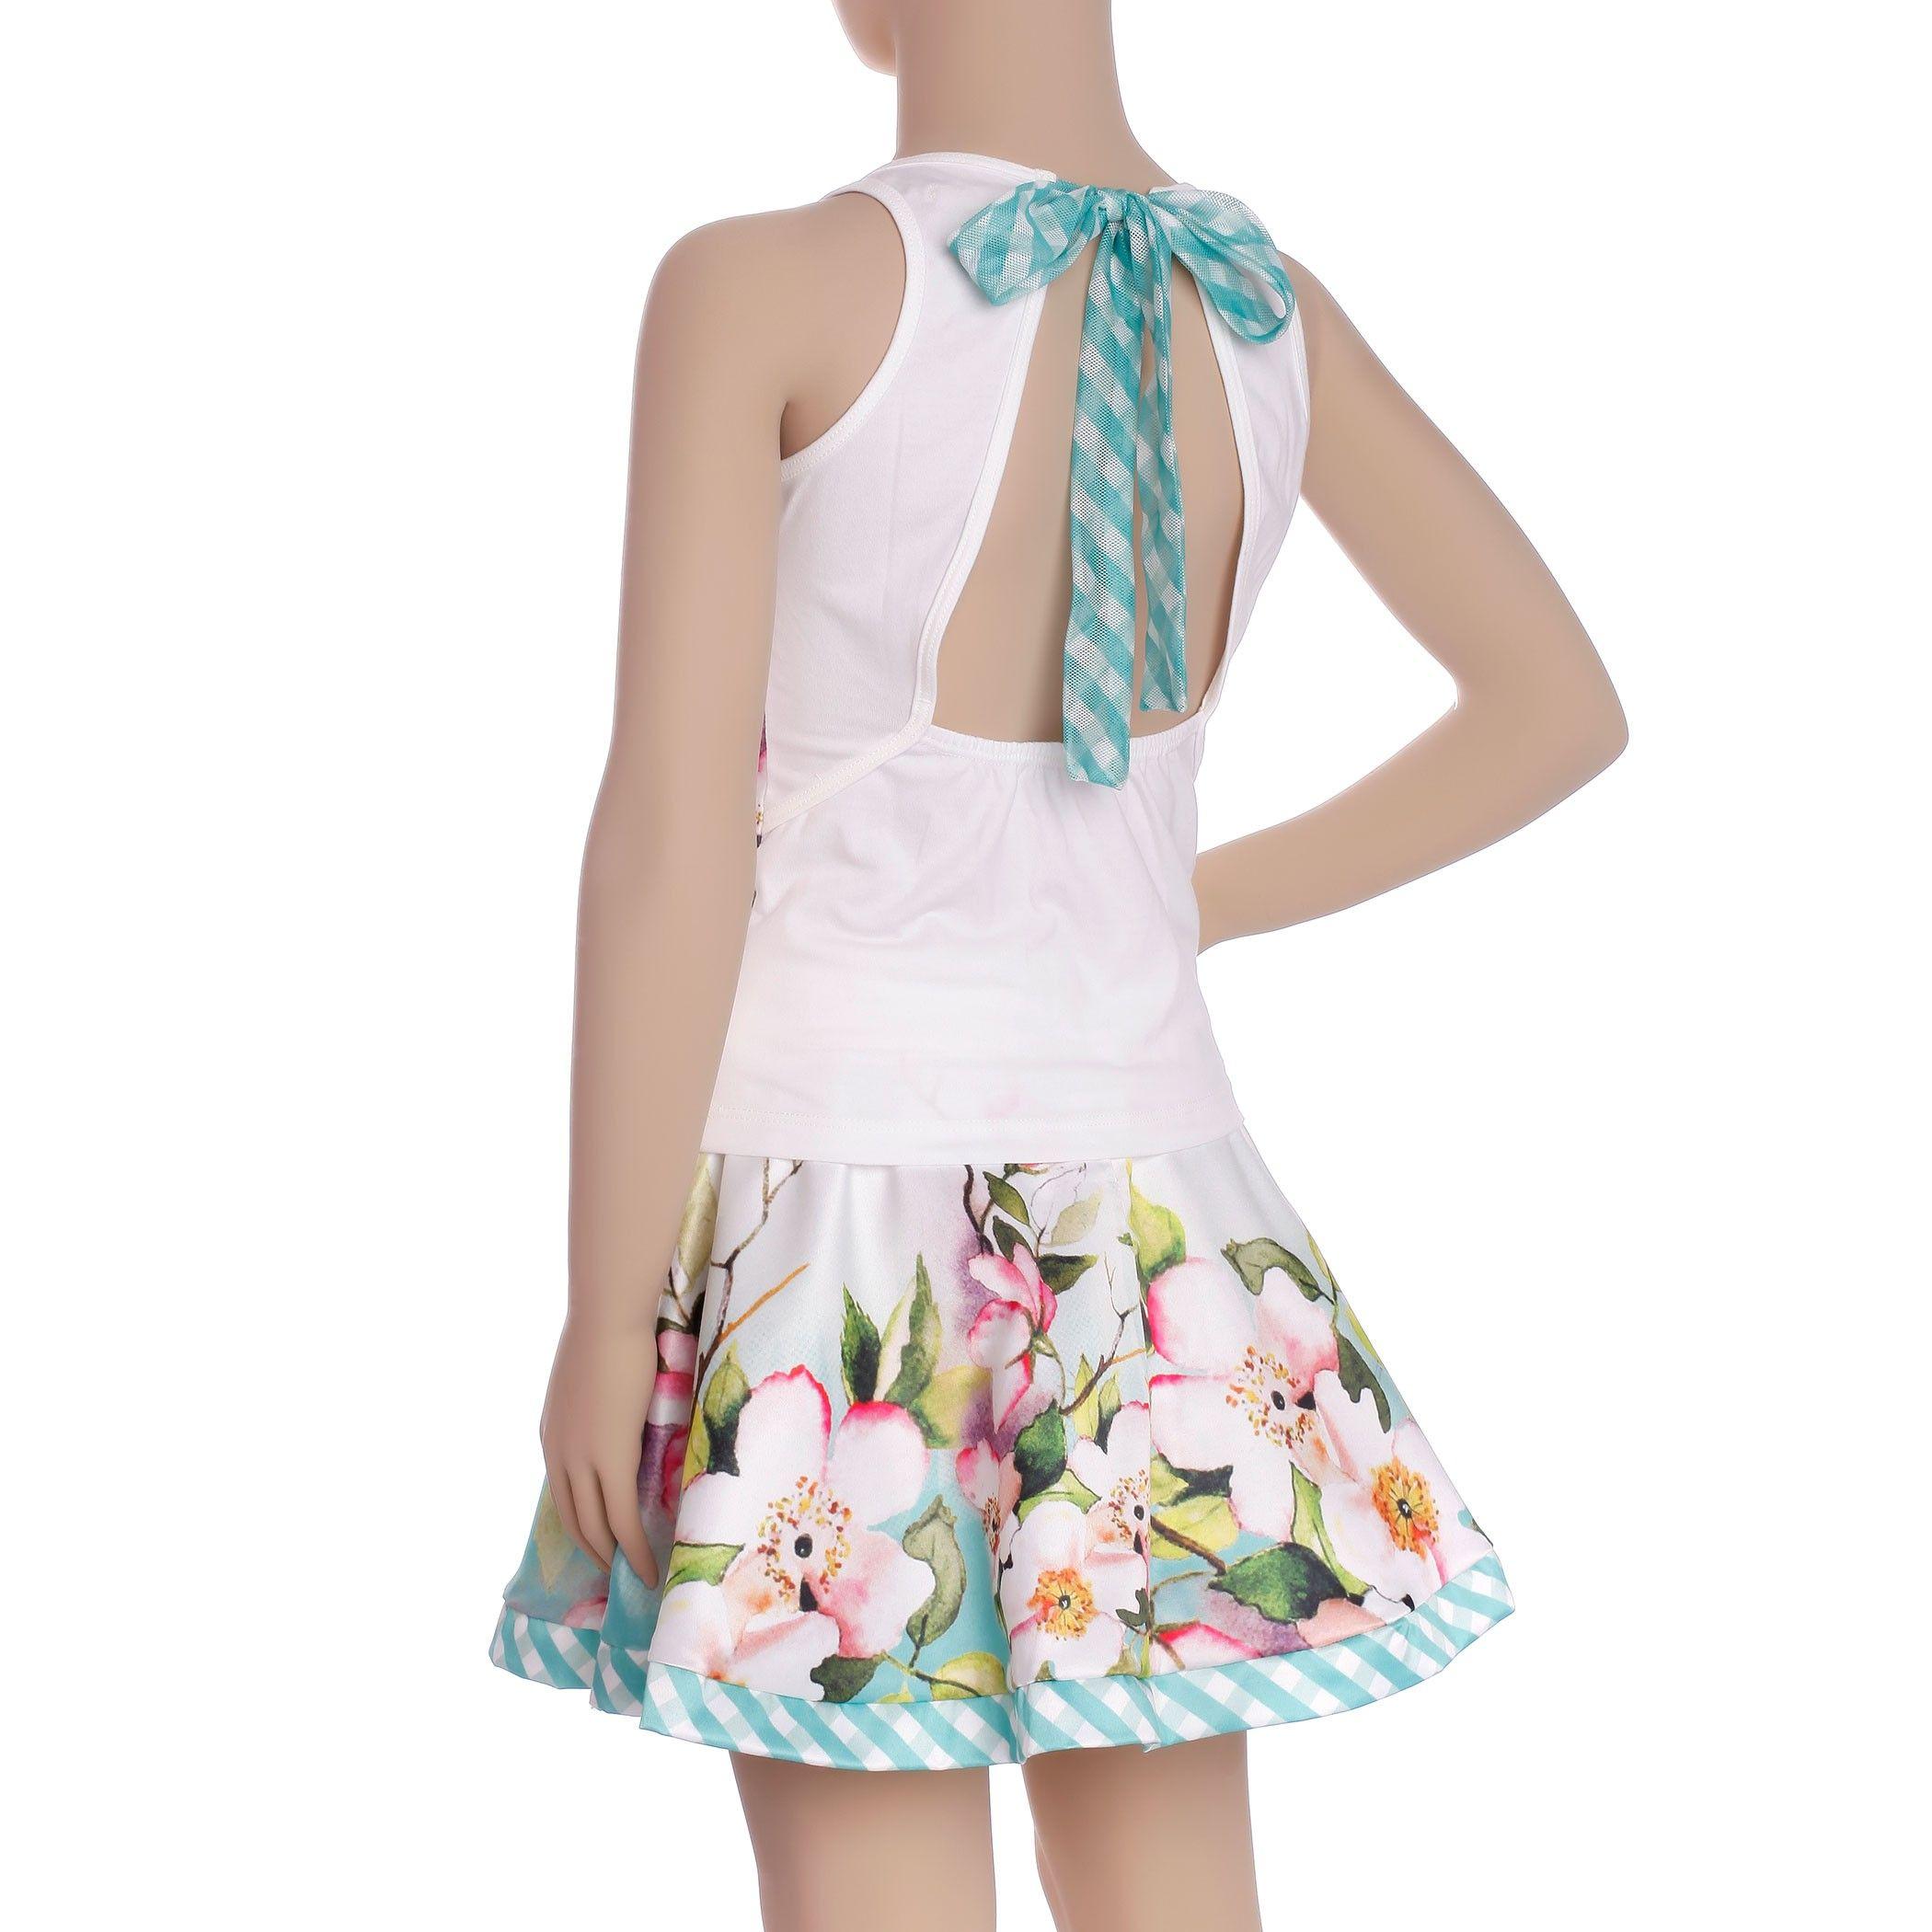 d31f73a3c Conjunto infantil Miss Cake com mix de estampas Digroup - Moda Infantil  Feminina Online